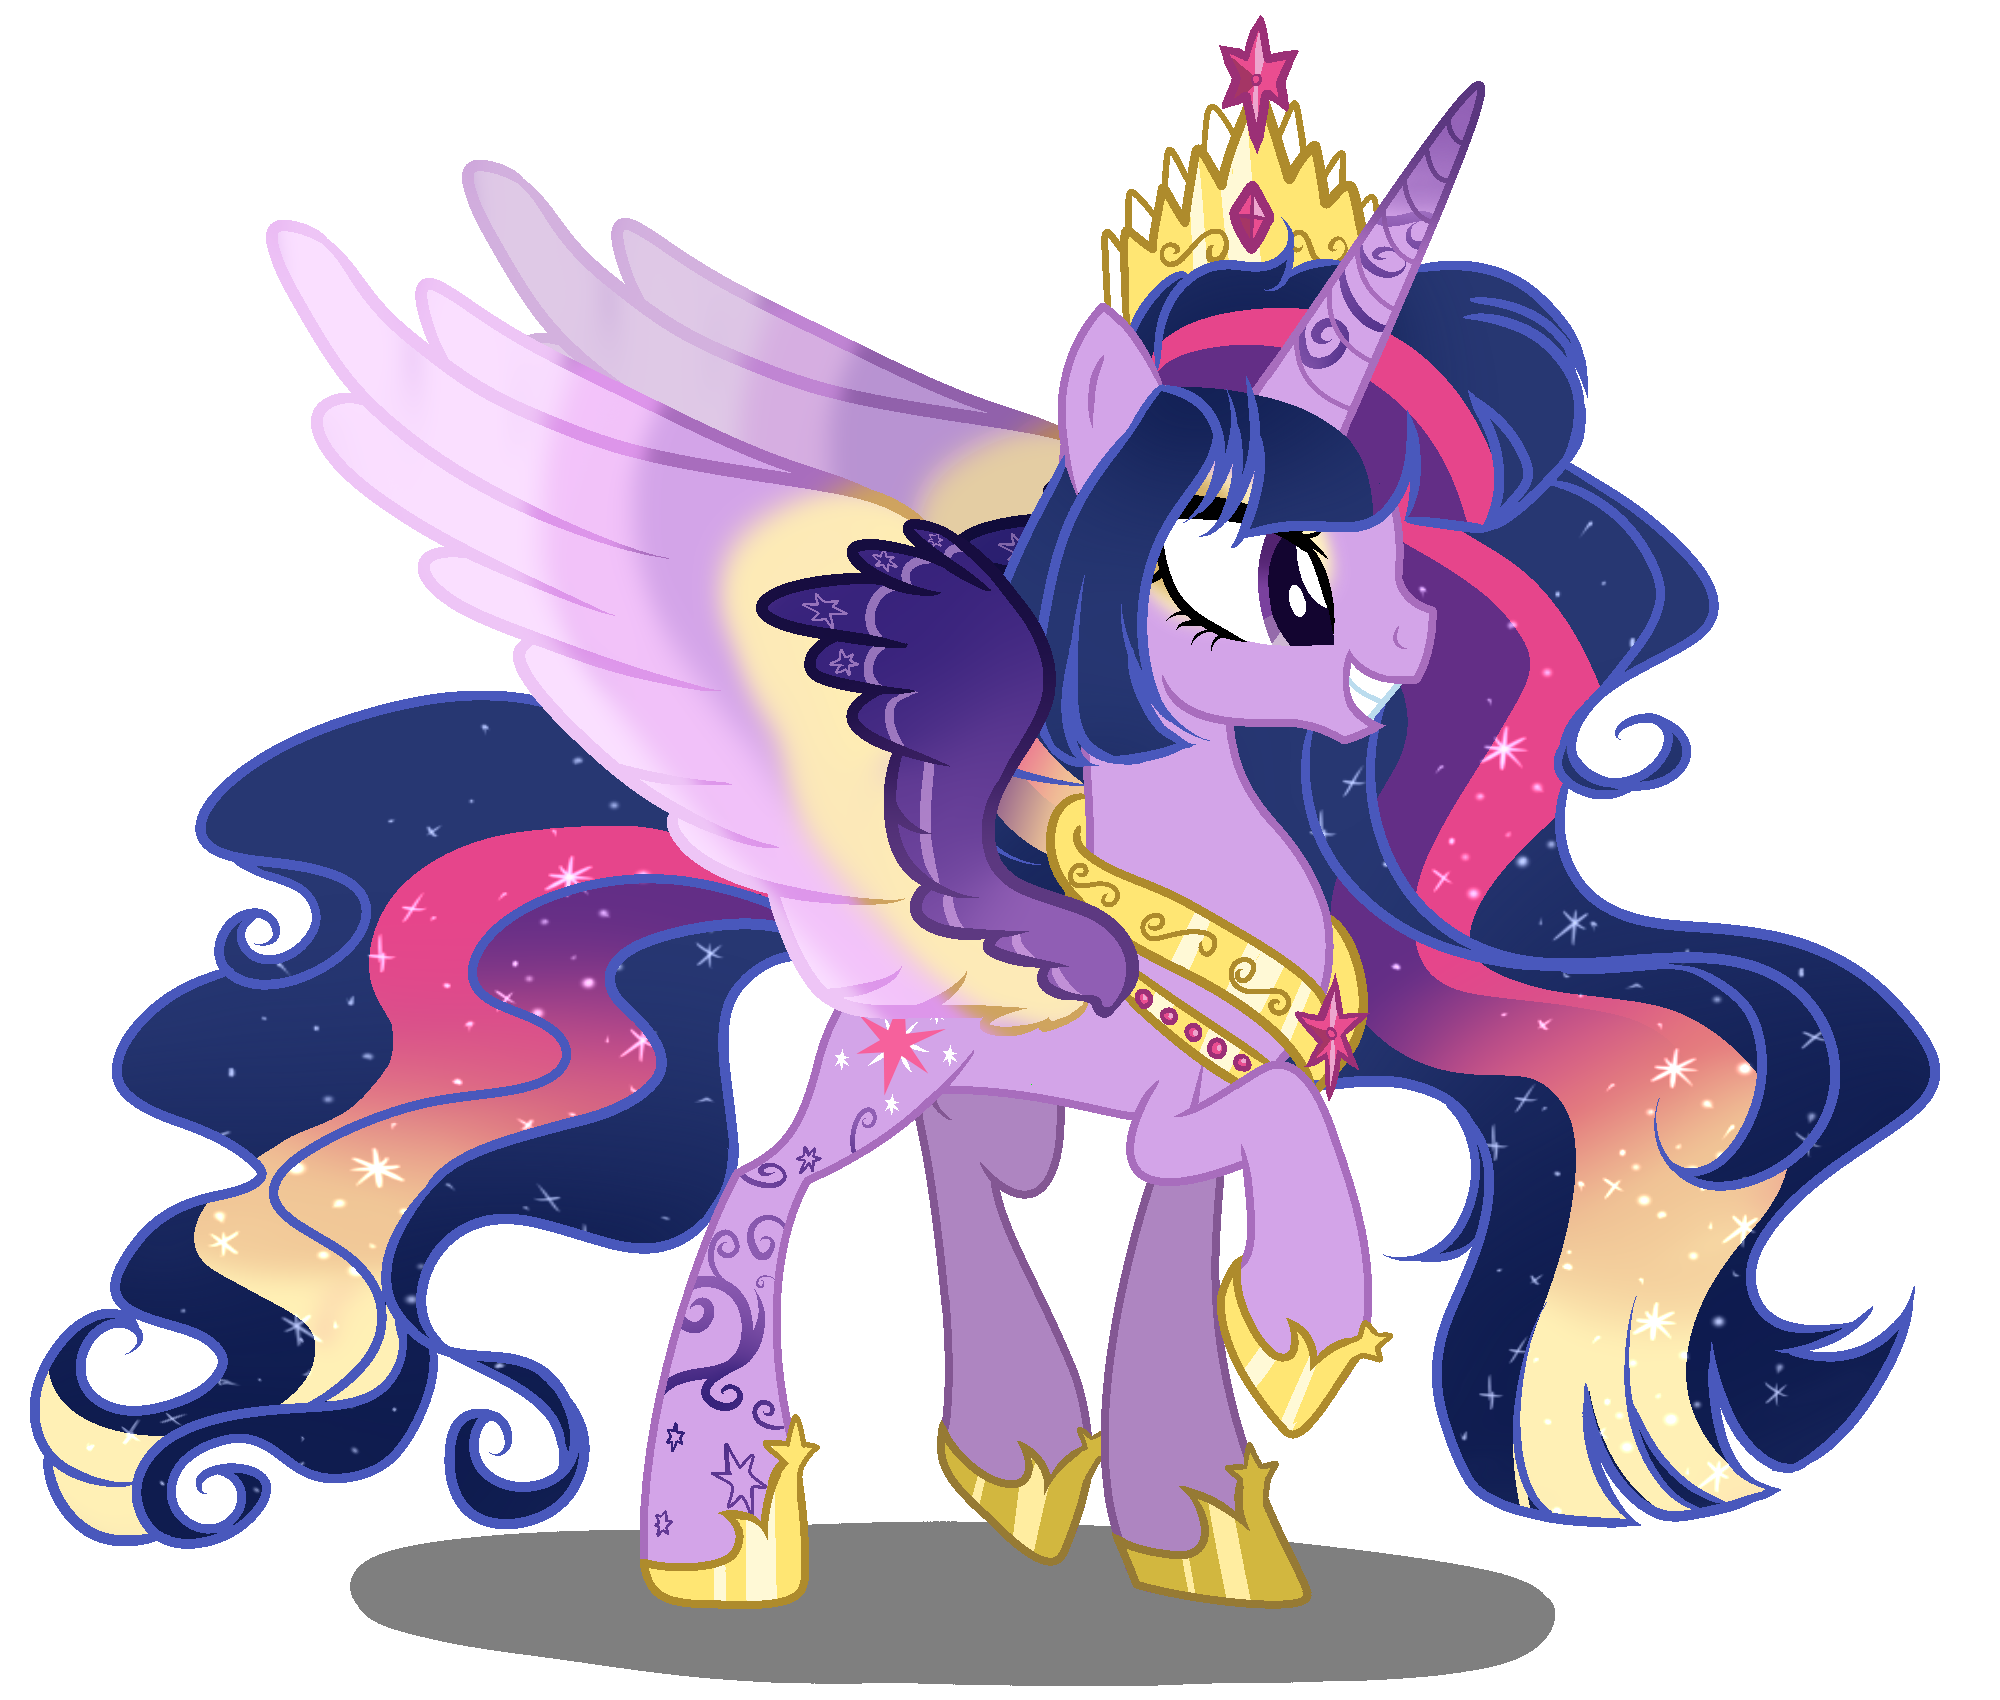 - MLD Princess Twilight Sparkle Next Gen By GihhBloonde On